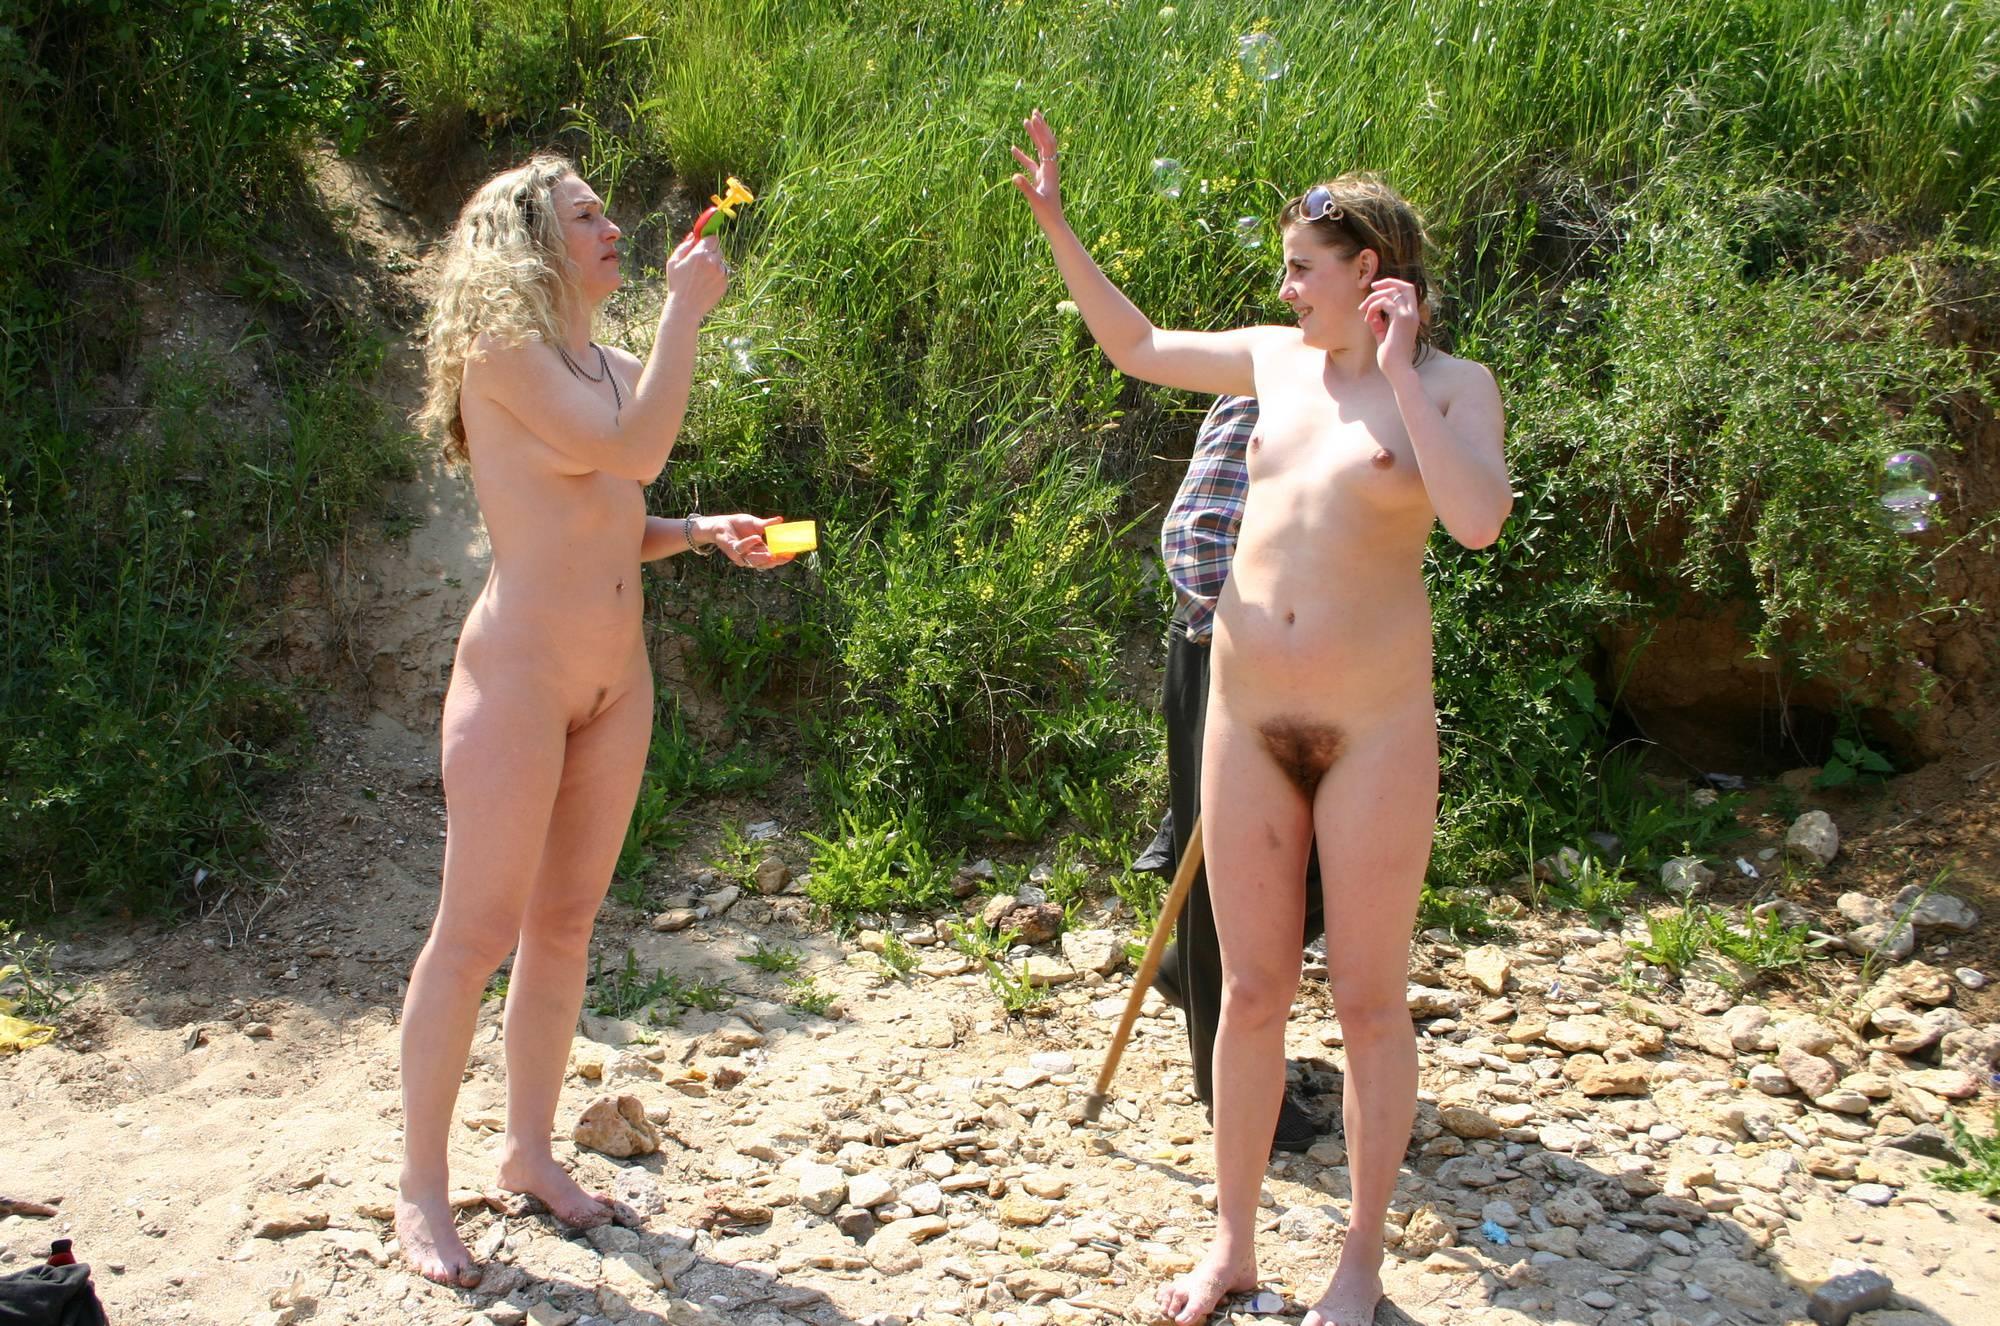 Nudist Gallery 2X Nude Balloon Bombing - 2